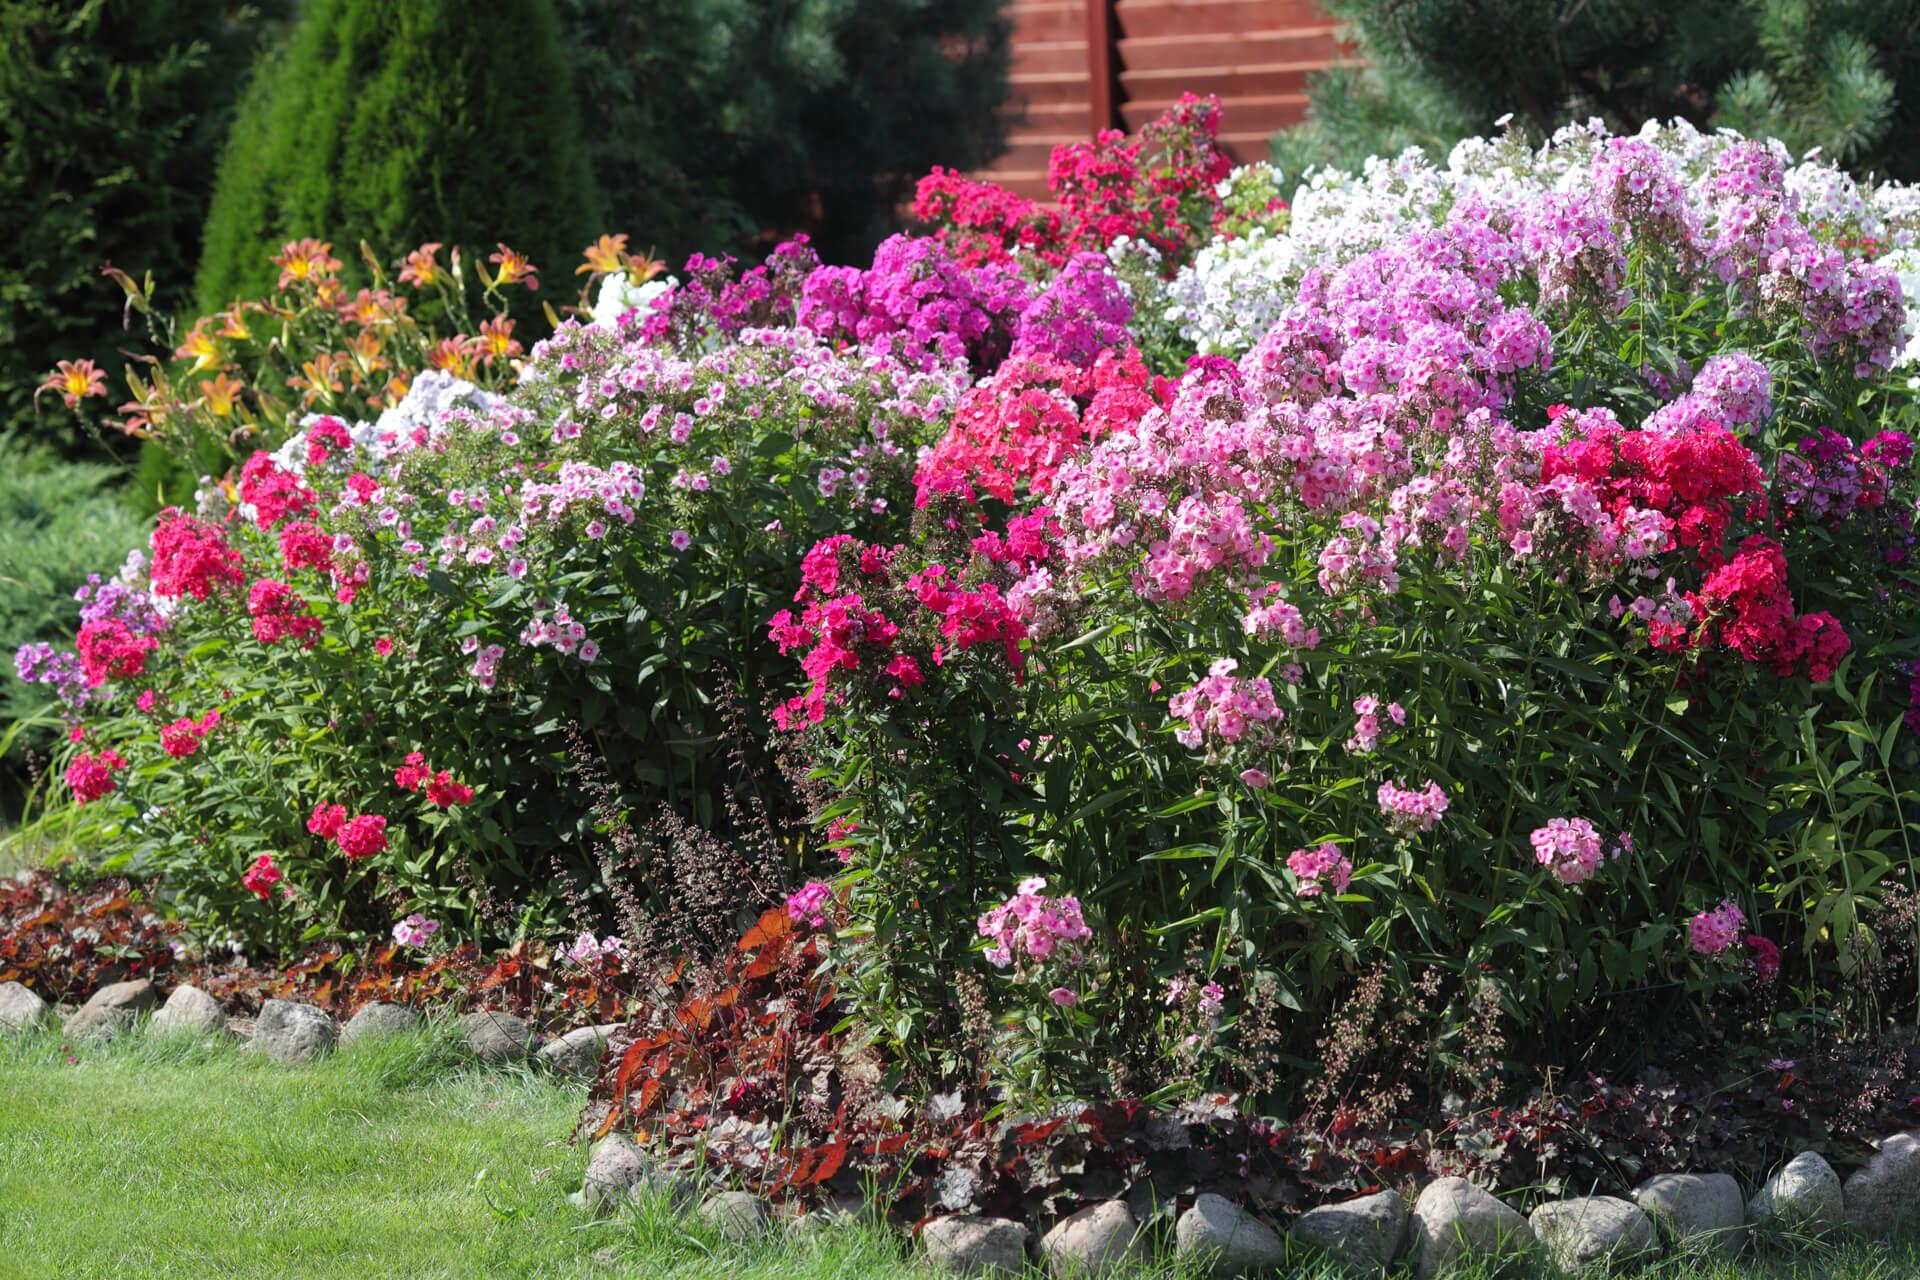 Plant ideas – care for a spirited garden